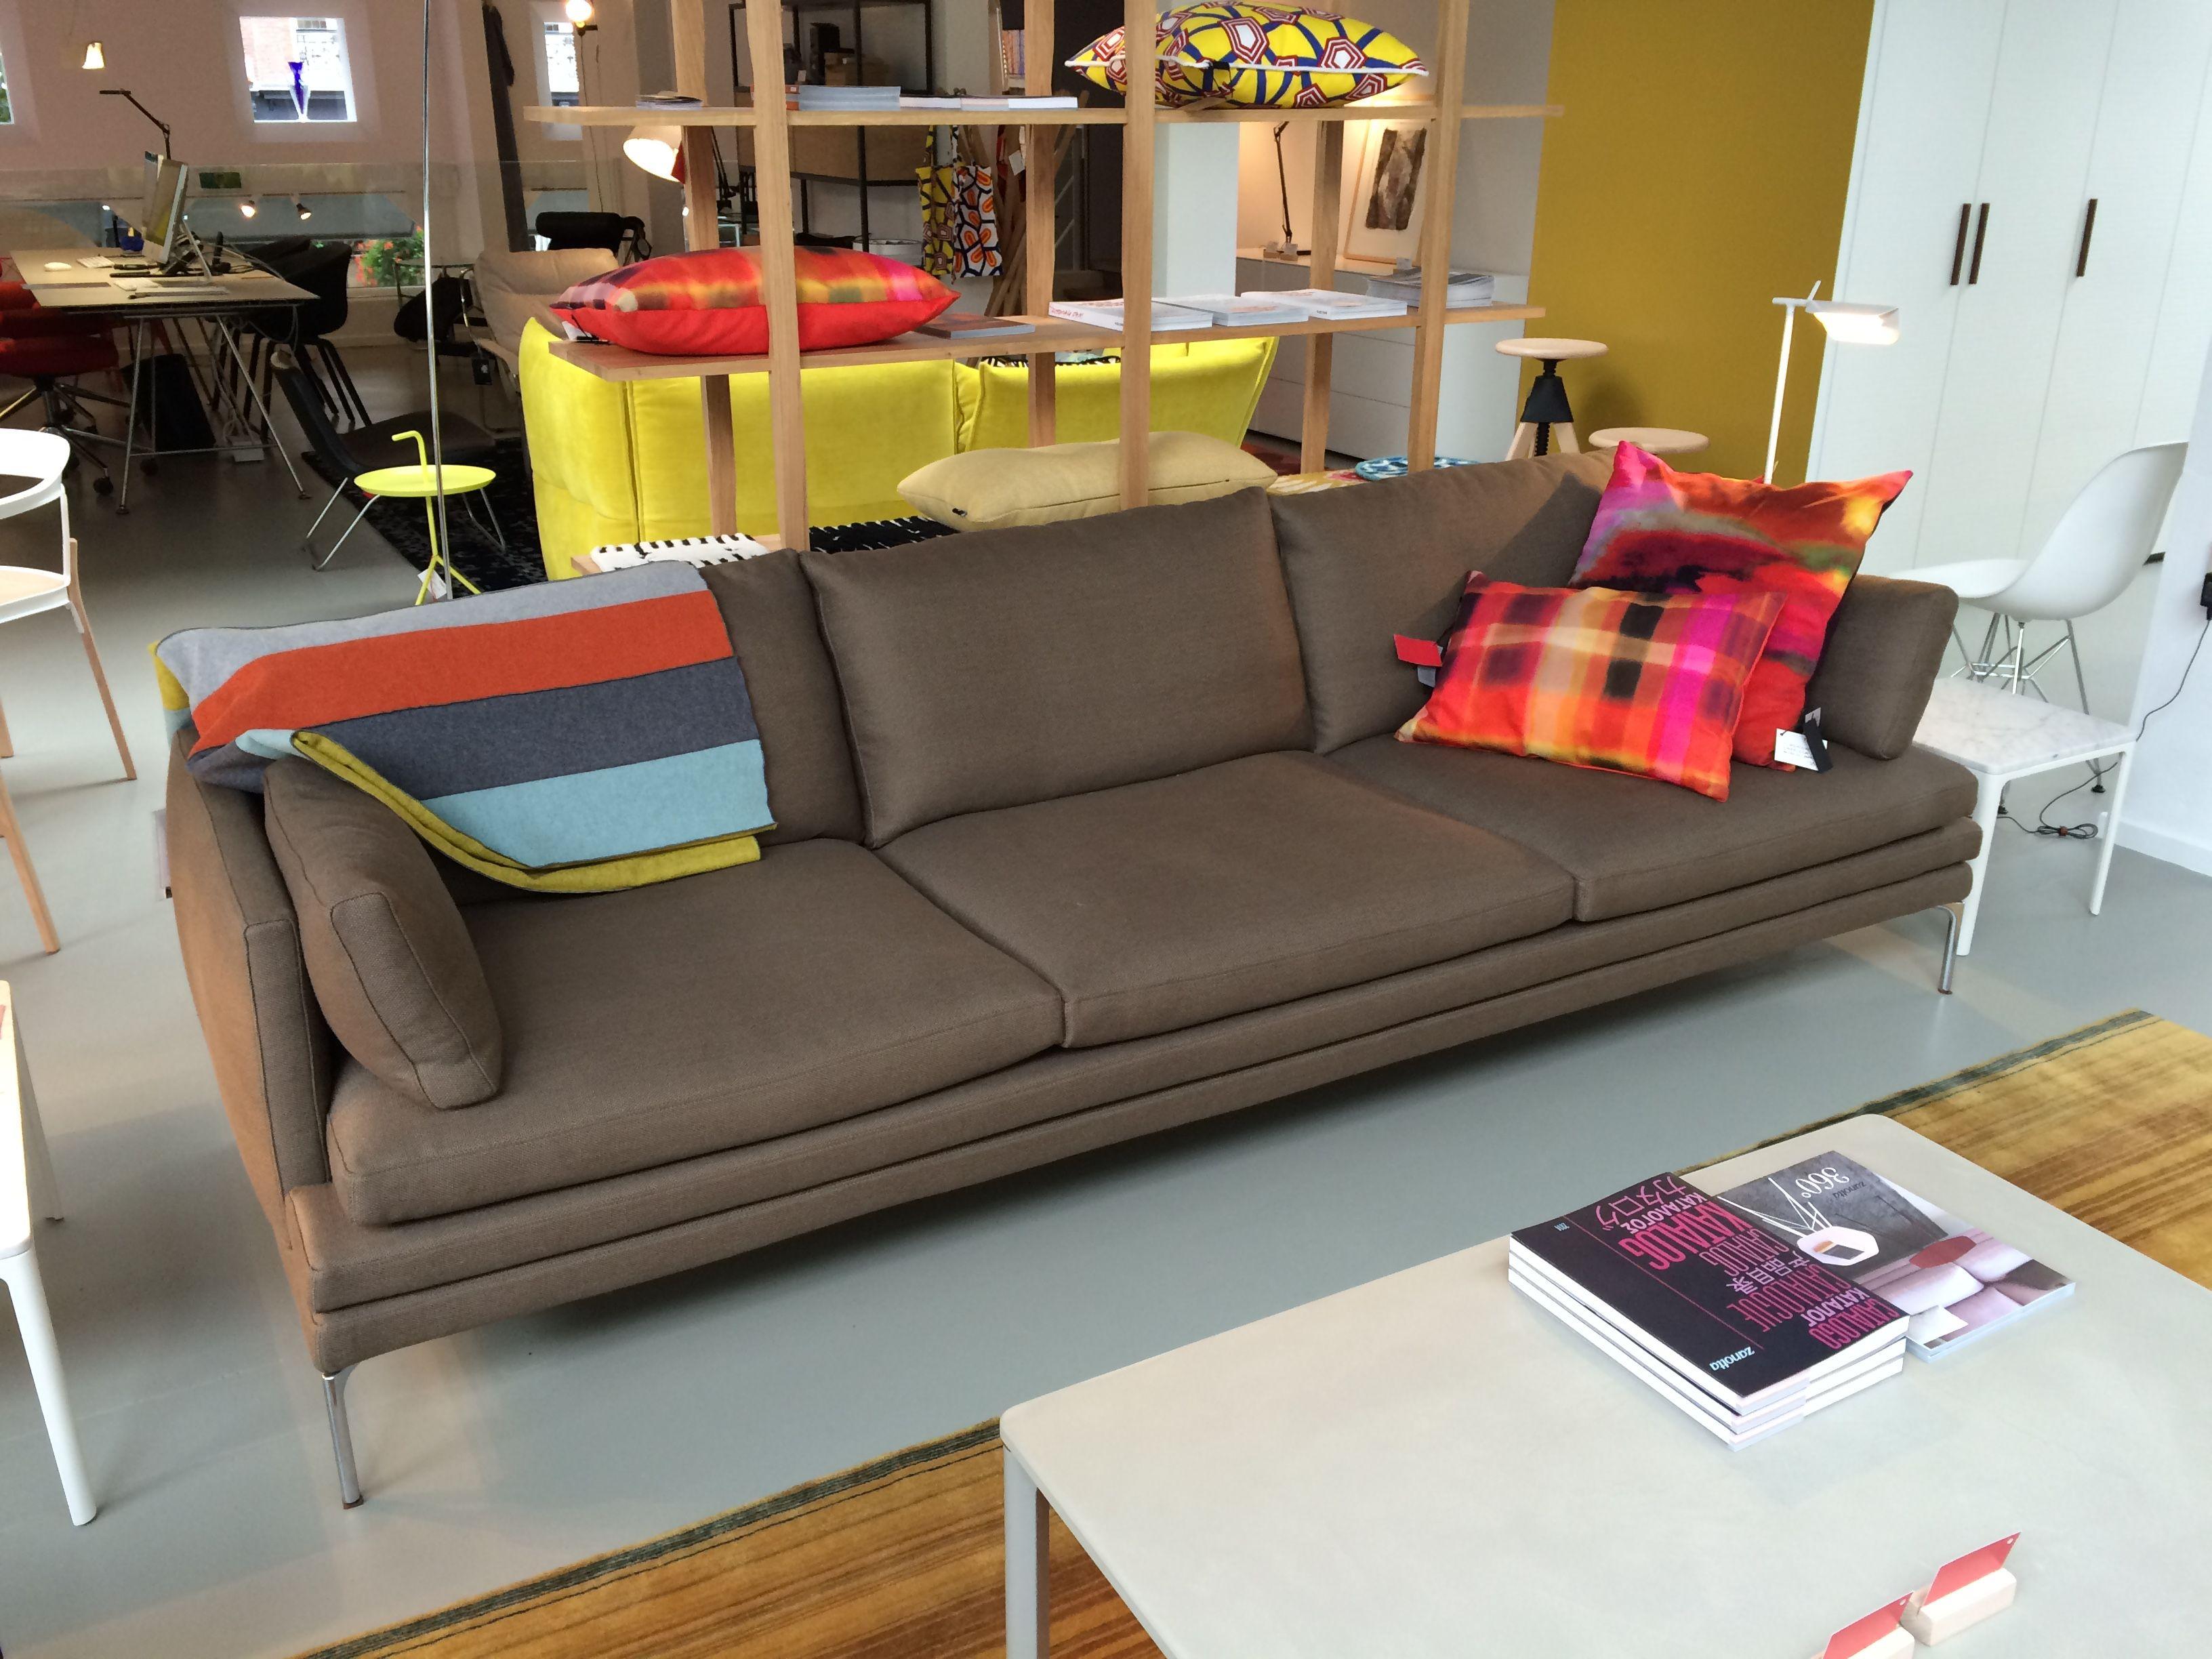 Blog DesignsDesign BlogsRaw WoodWood FurnitureFurniture DesignBuilding  FurnitureOffice FurnitureSofa DesignInterior Design. Cozy Sofa With Raw Oak  Base U2013 El ... Pictures